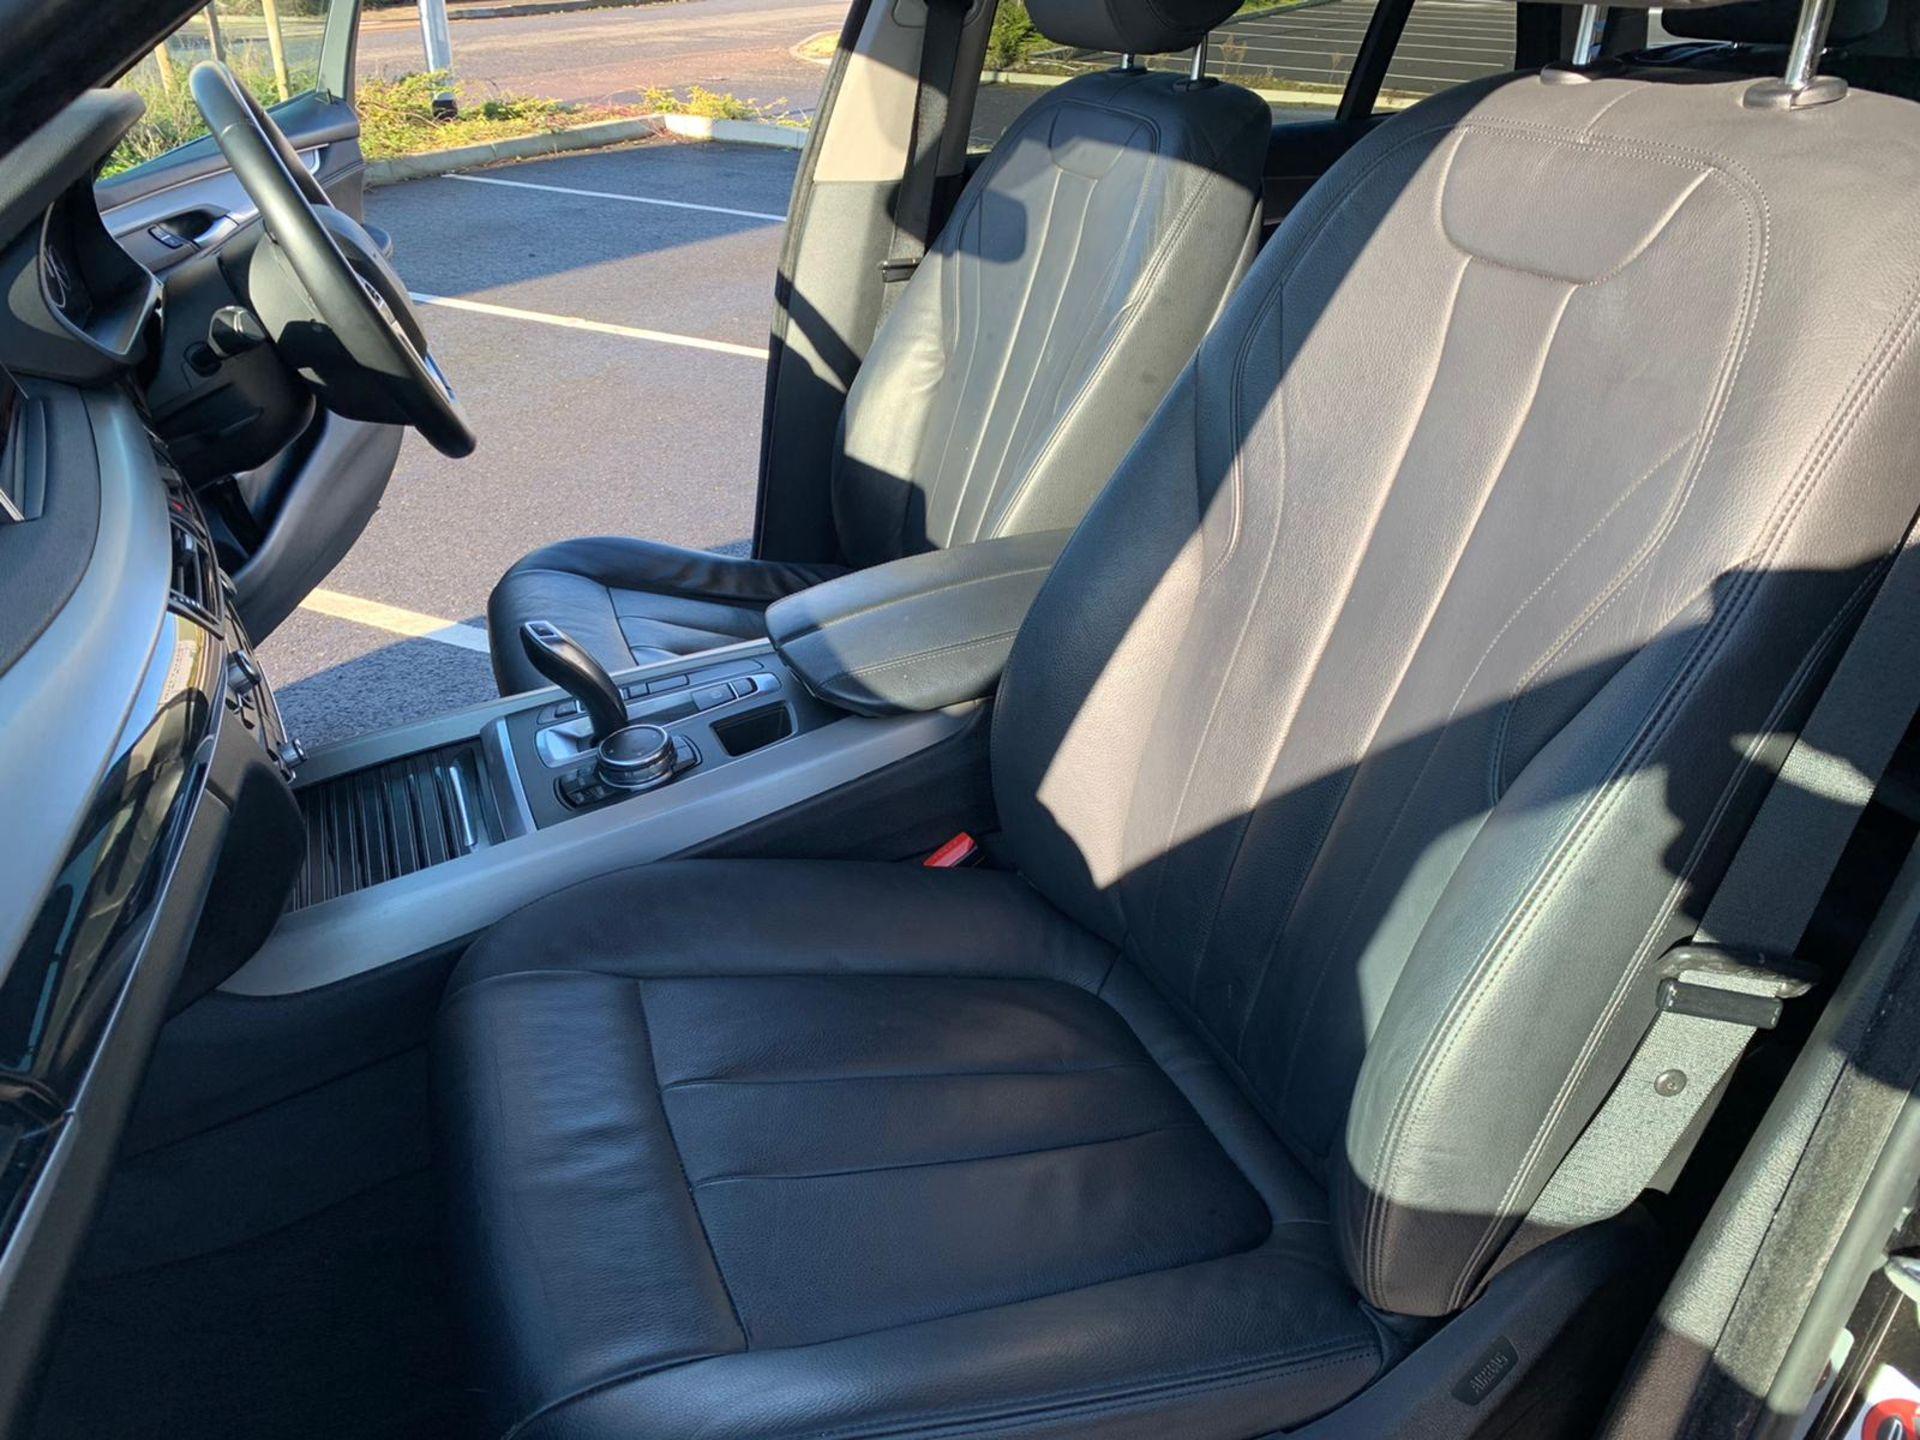 "(Reserve Met) BMW X5 2.0d S-DRIVE ""Special Equipment"" Auto- 7 Seater -16 Reg - Sat Nav- (New Shape) - Image 17 of 43"